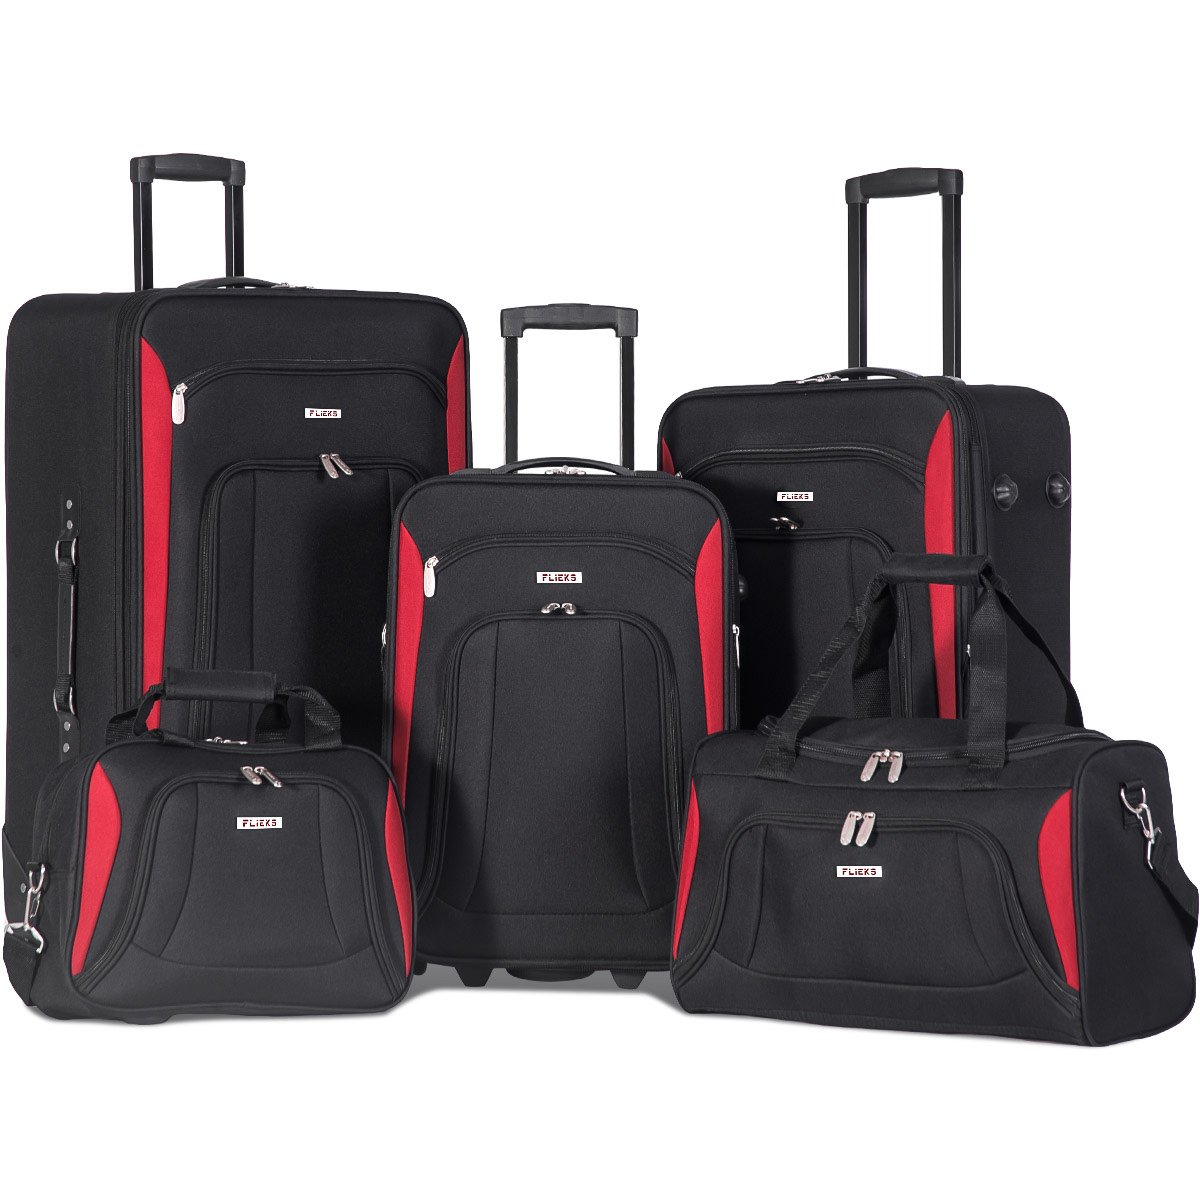 Merax Newest 5 Piece Set Expandable Rolling Suitcase Softshell Deluxe Luggage Set (Black.)